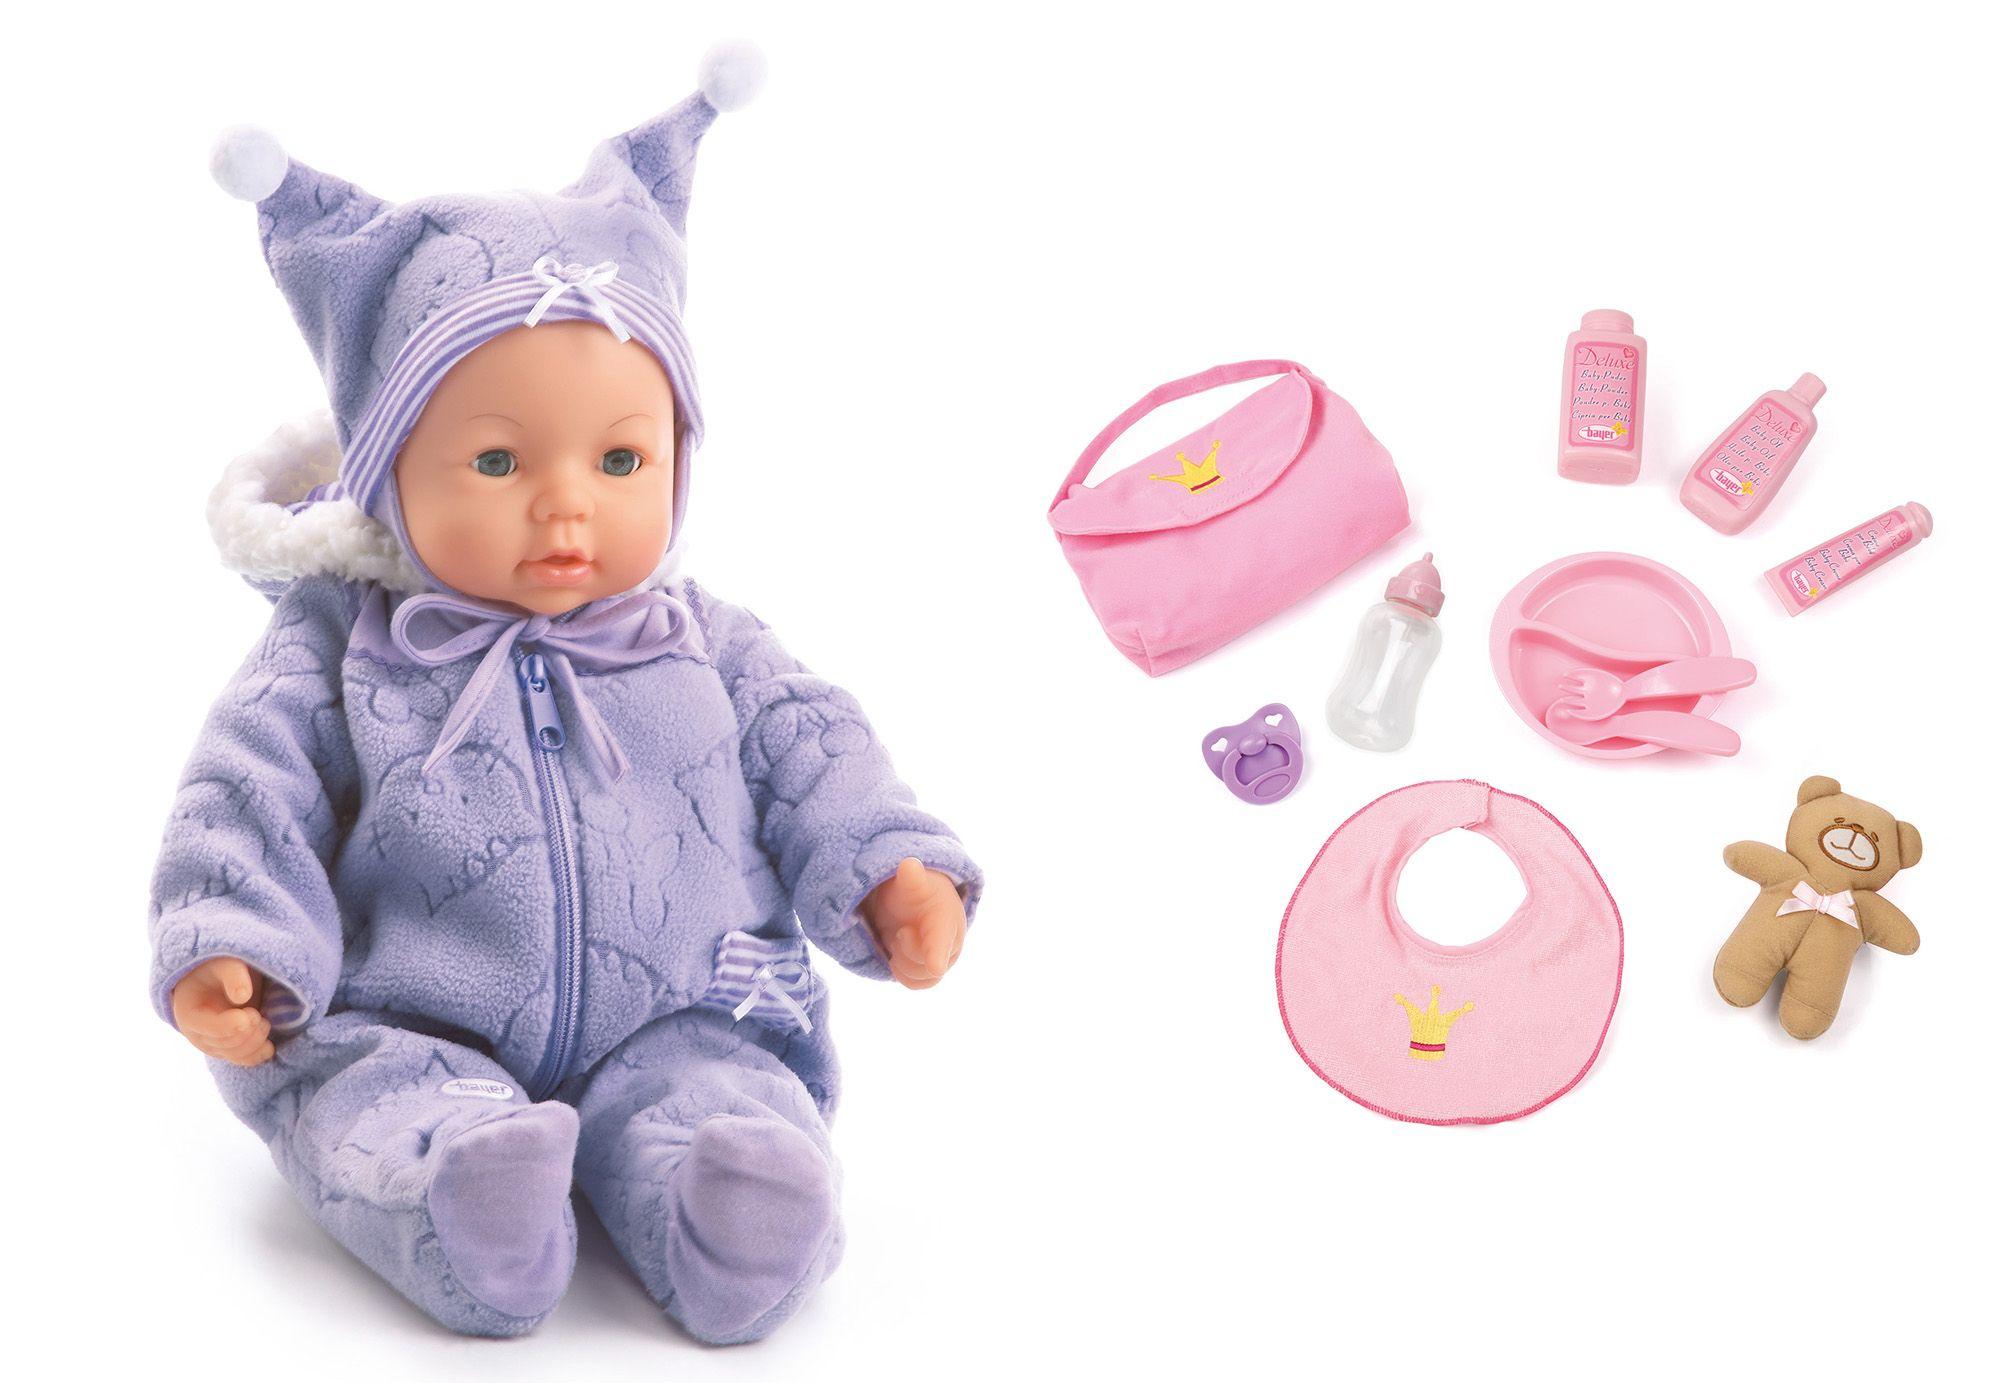 BAYER Bayer Design Babypuppe mit Funktion inkl. Zubehör, »Piccolina Magic Eyes«